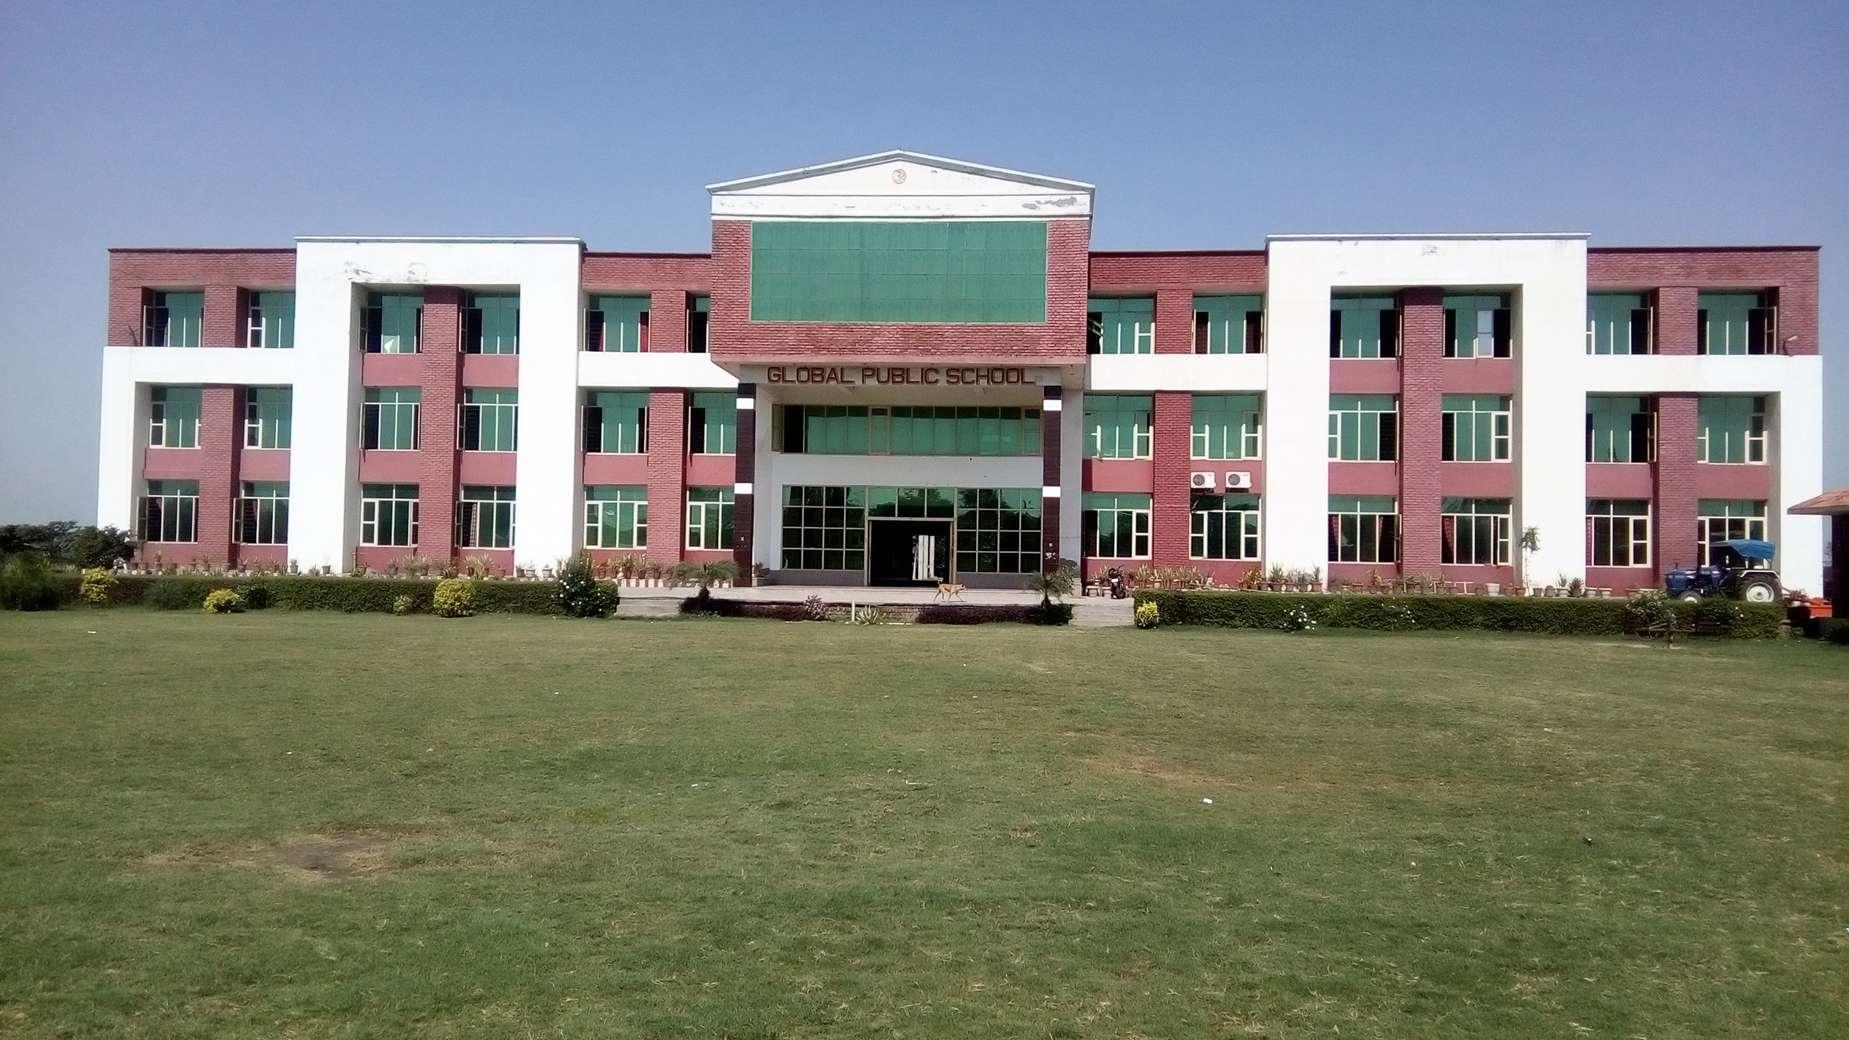 GLOBAL PUBLIC SCHOOL 6th MILE STONE KHANPUR KALAN ROAD GOHANA 531004